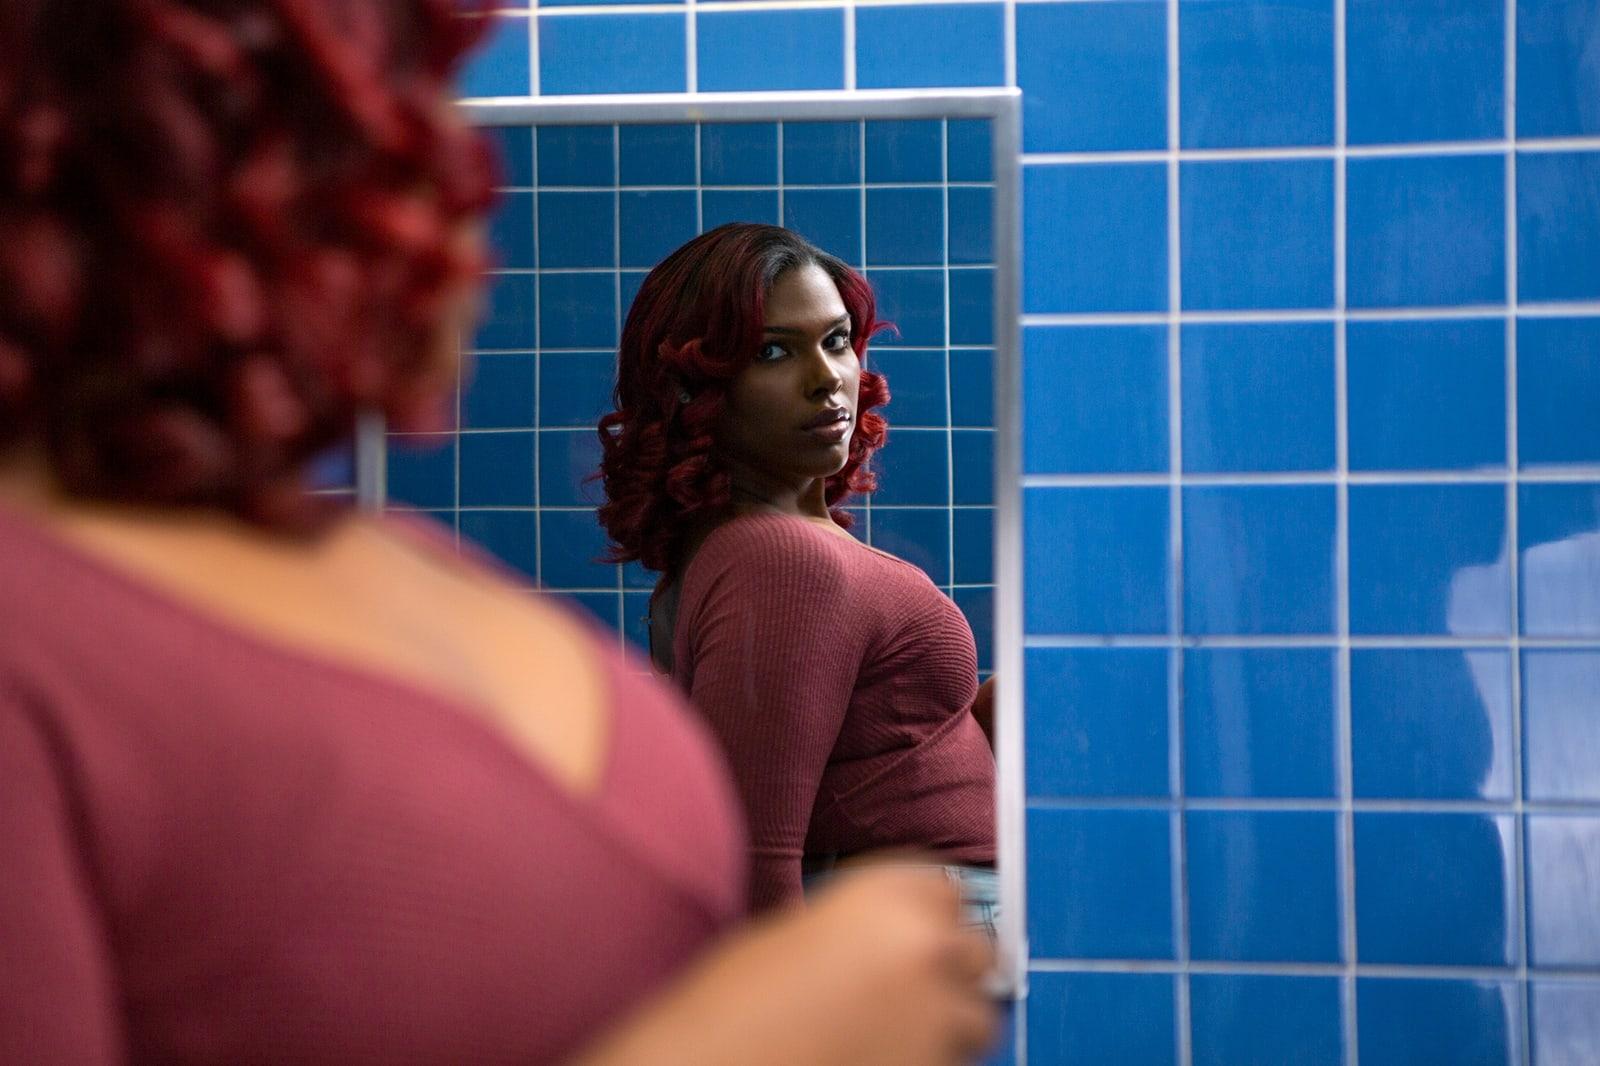 The Fenway Institute Epidemiology Team Launches LITE Plus Transgender Health Study